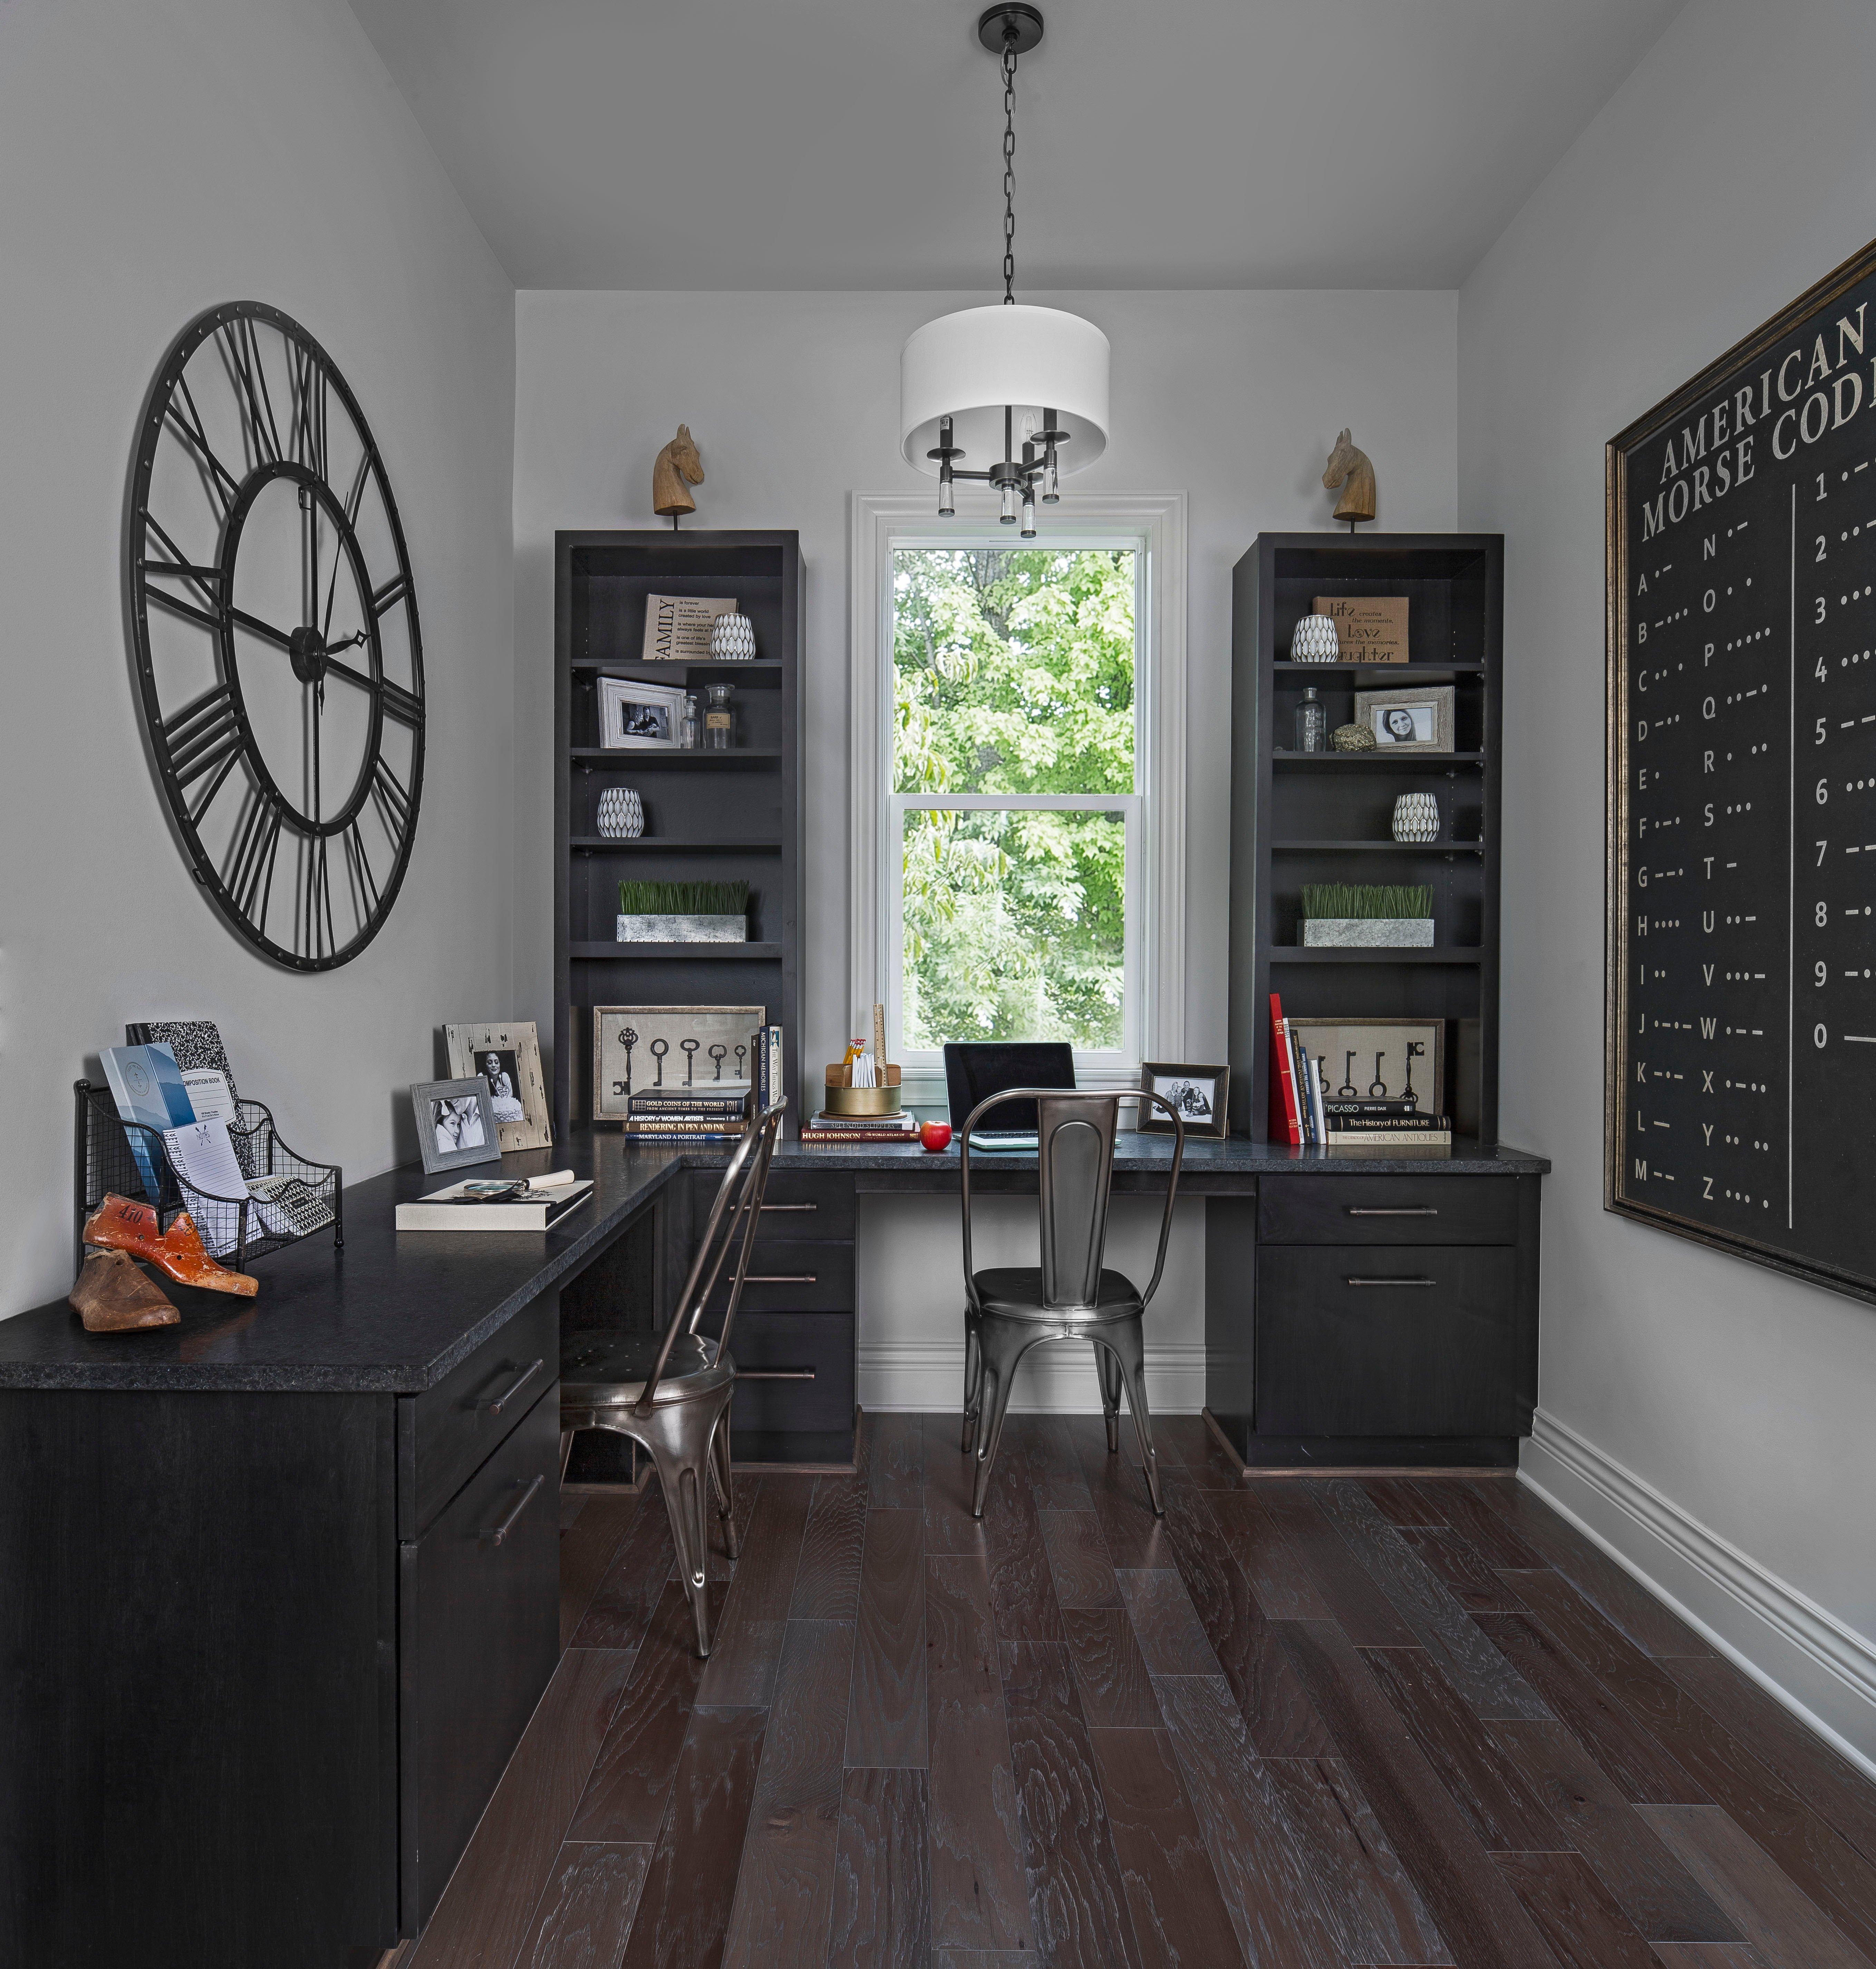 Home Office-KSI-Dura Supreme cabinetry